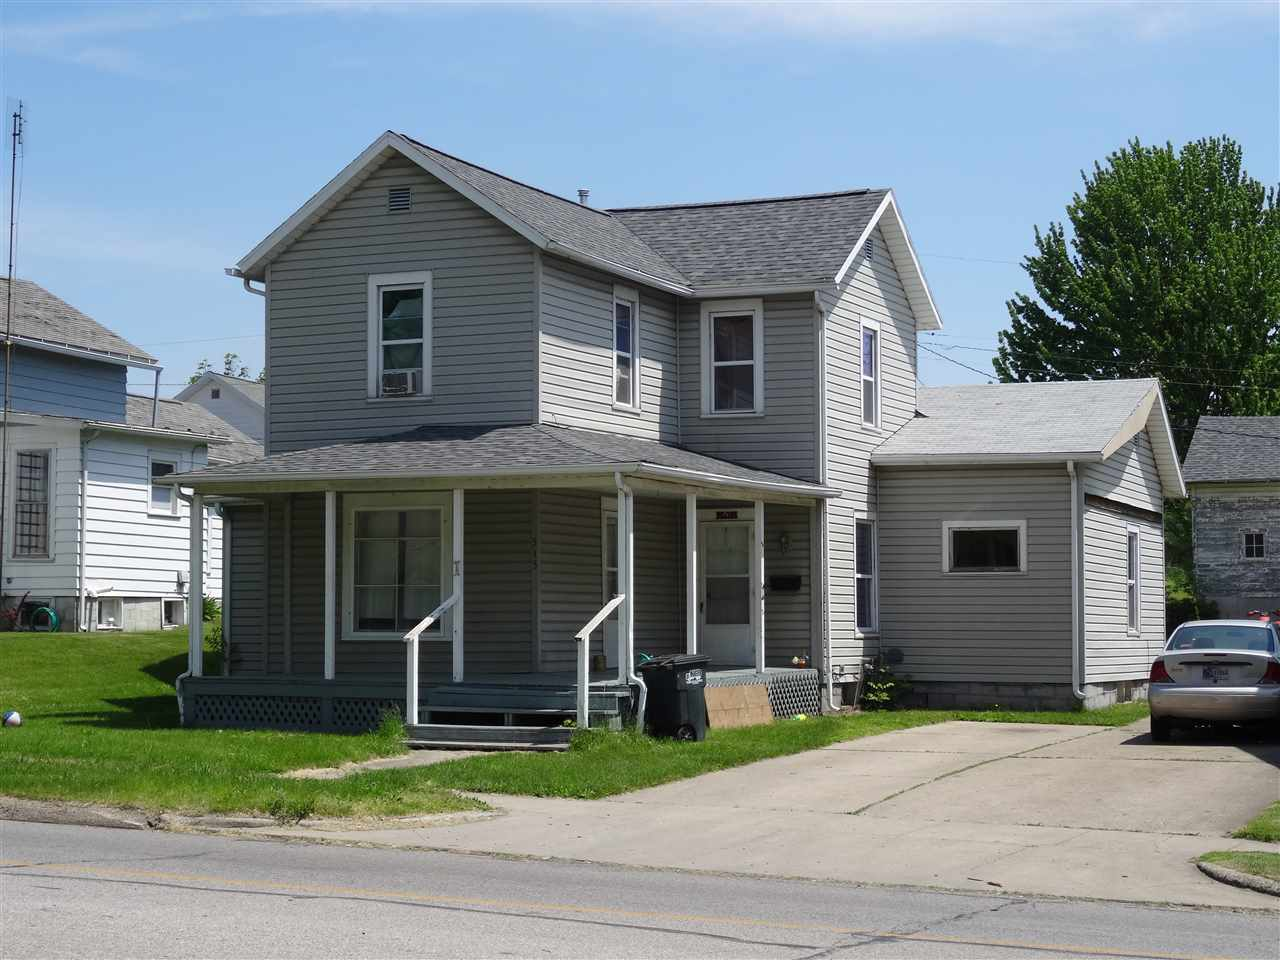 515 S Main St, Kendallville, IN 46755